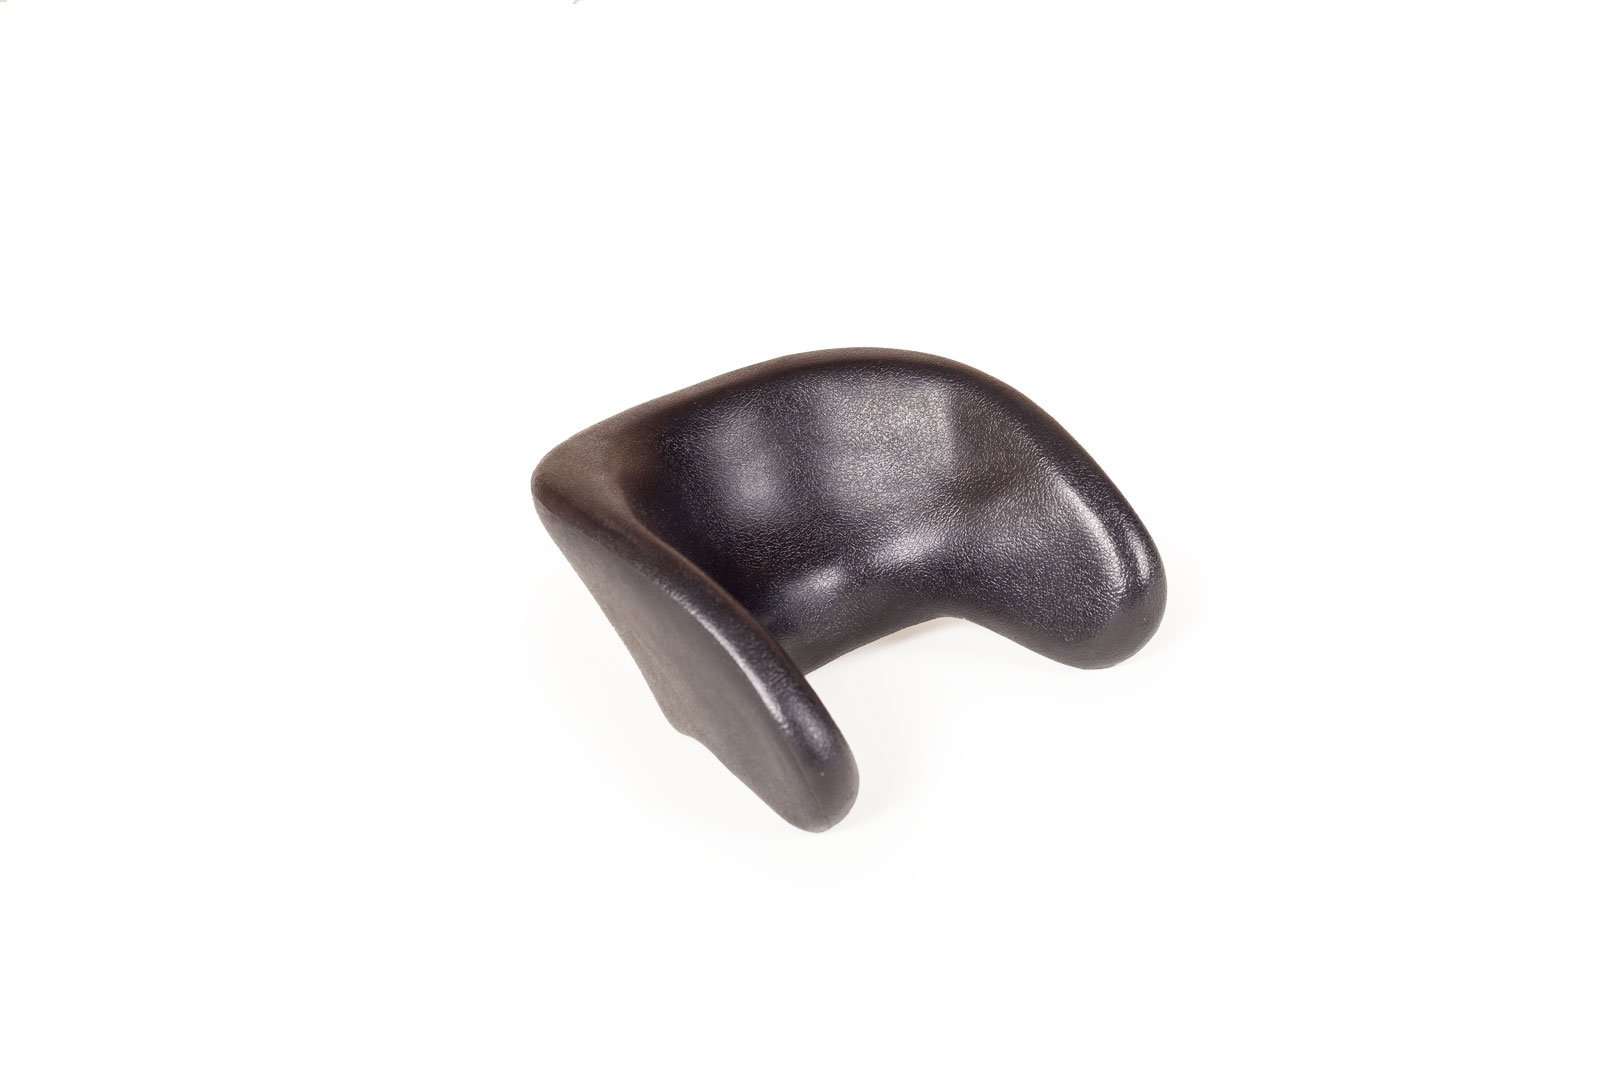 commode headrest